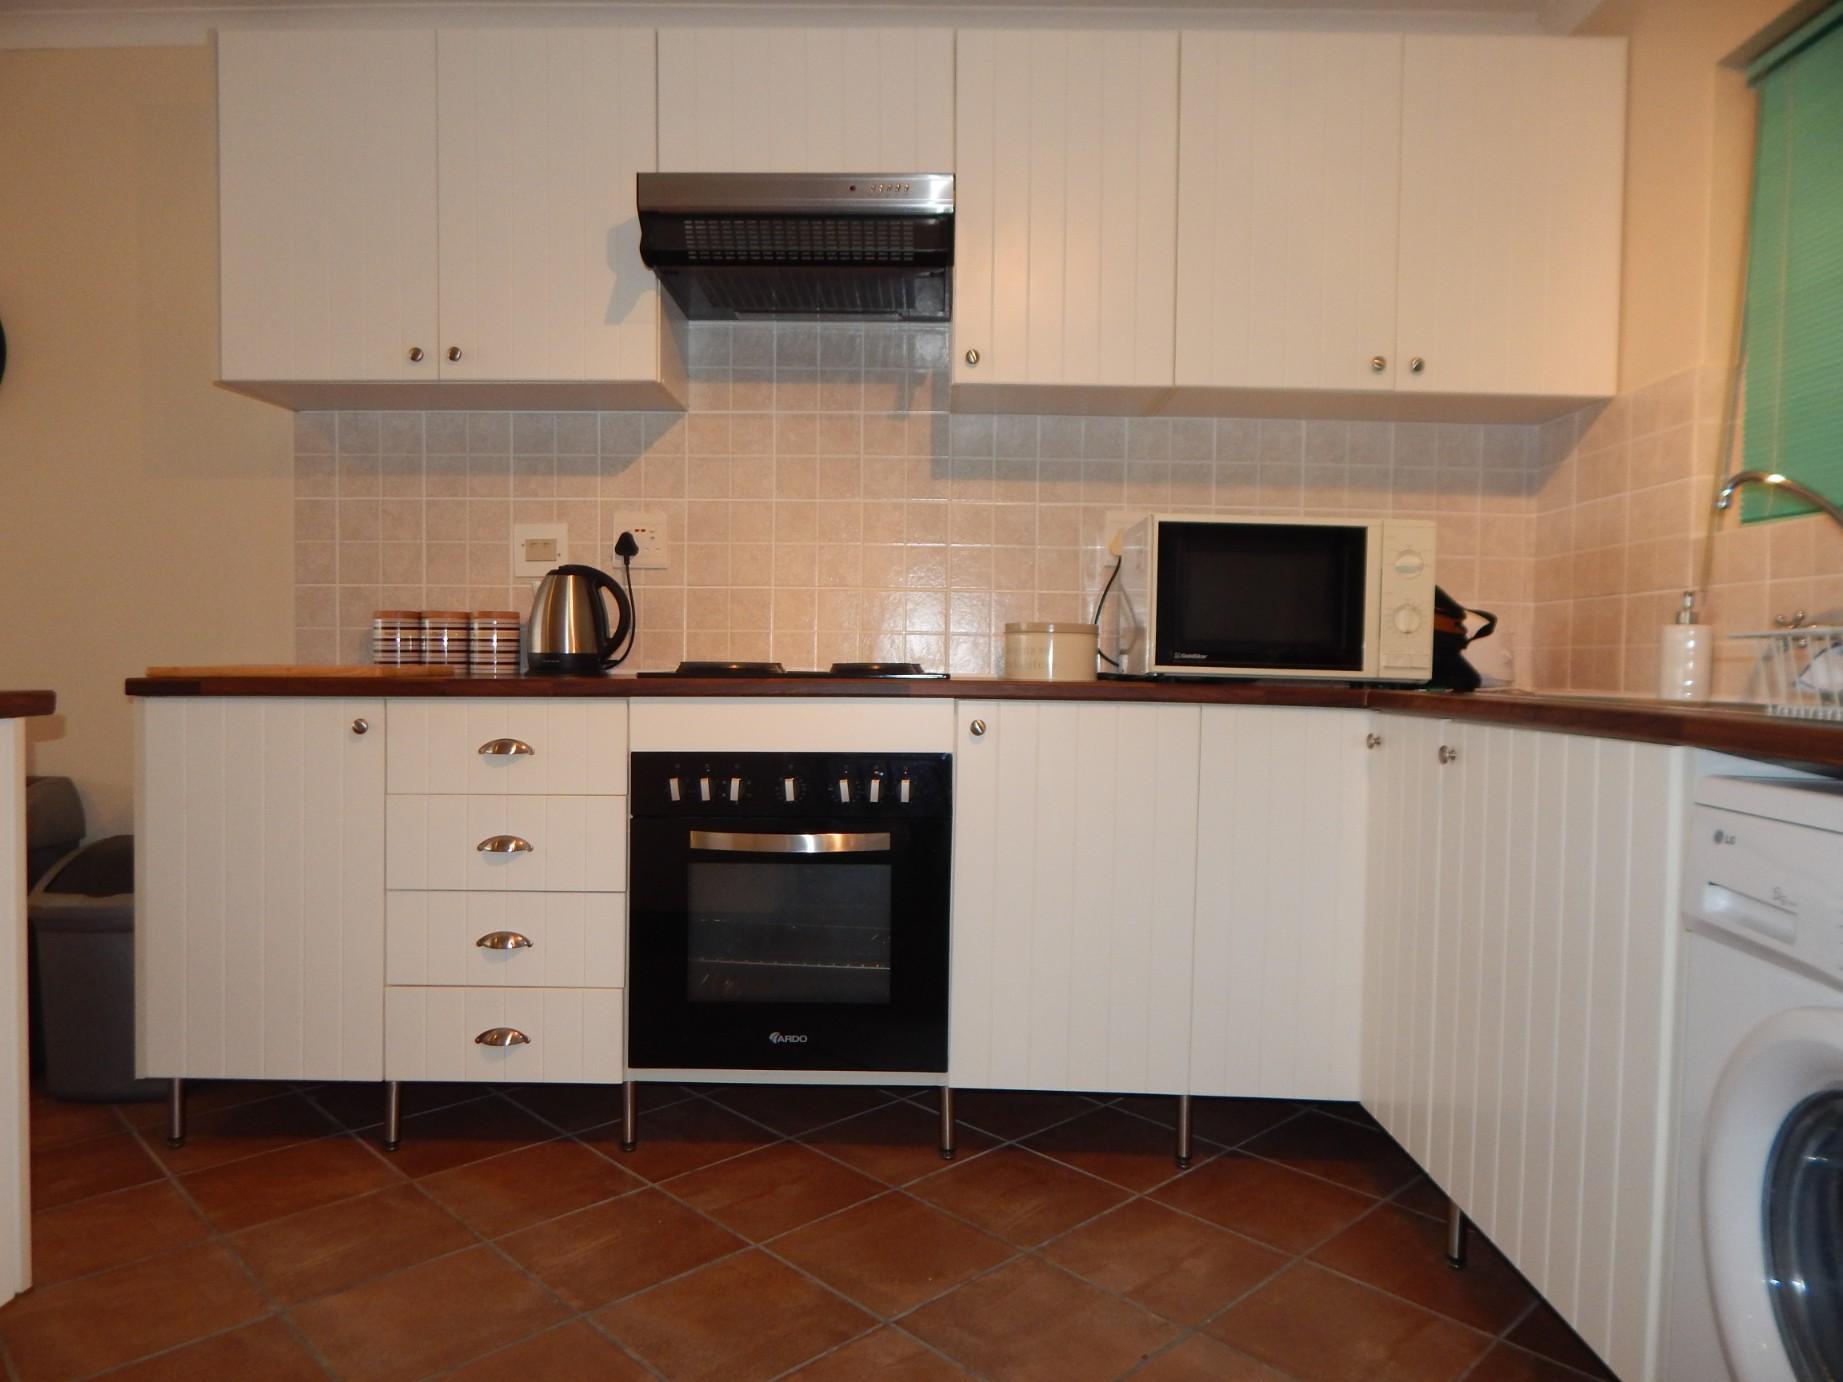 3 Bedroom Apartment for sale in De Bakke ENT0066483 : photo#5